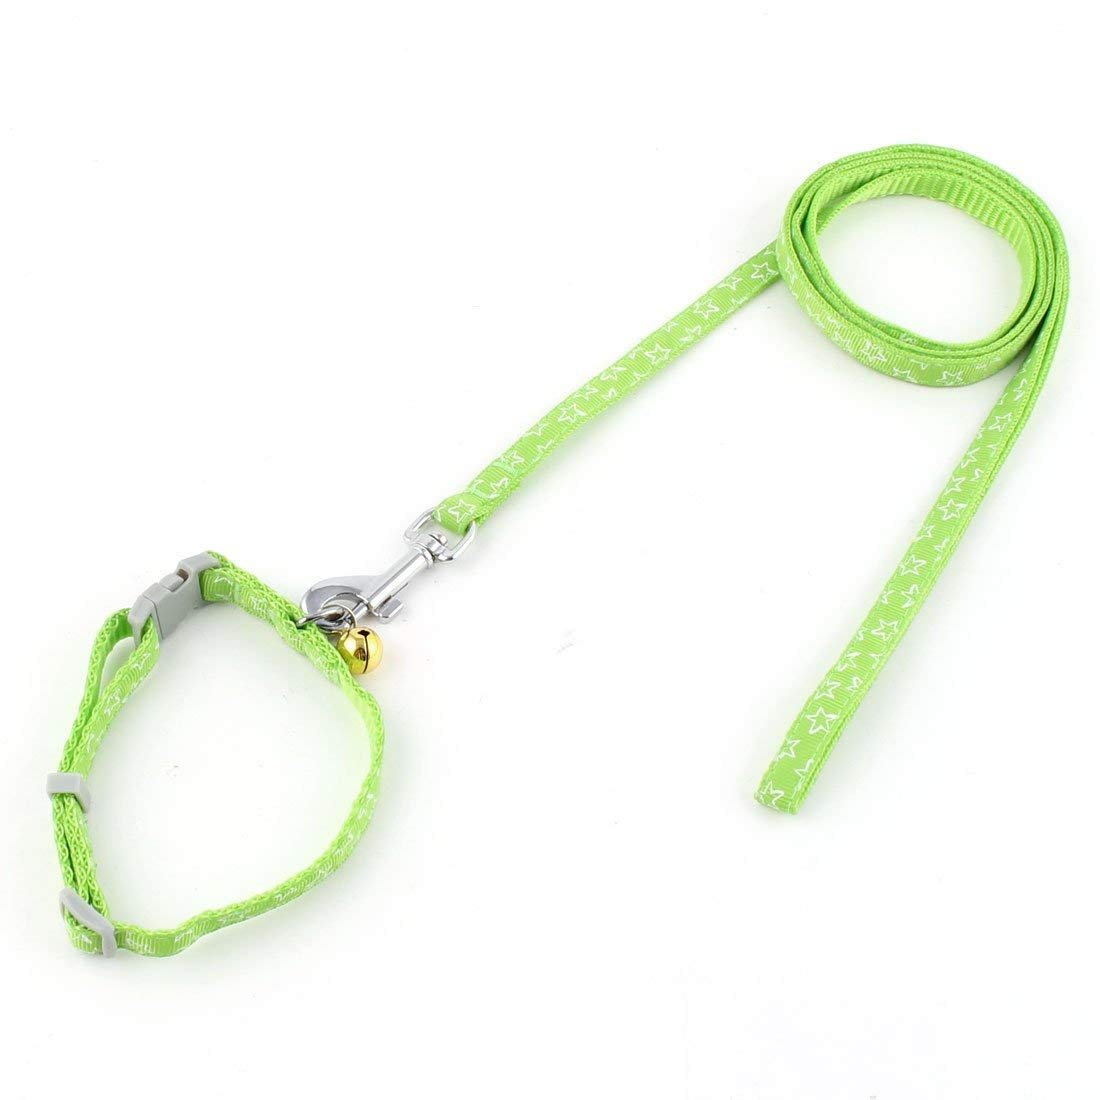 1Pc Green   Puppy Dog Pet Bell Decor Star Pattern Collar Walking Training Lead Rope Leash